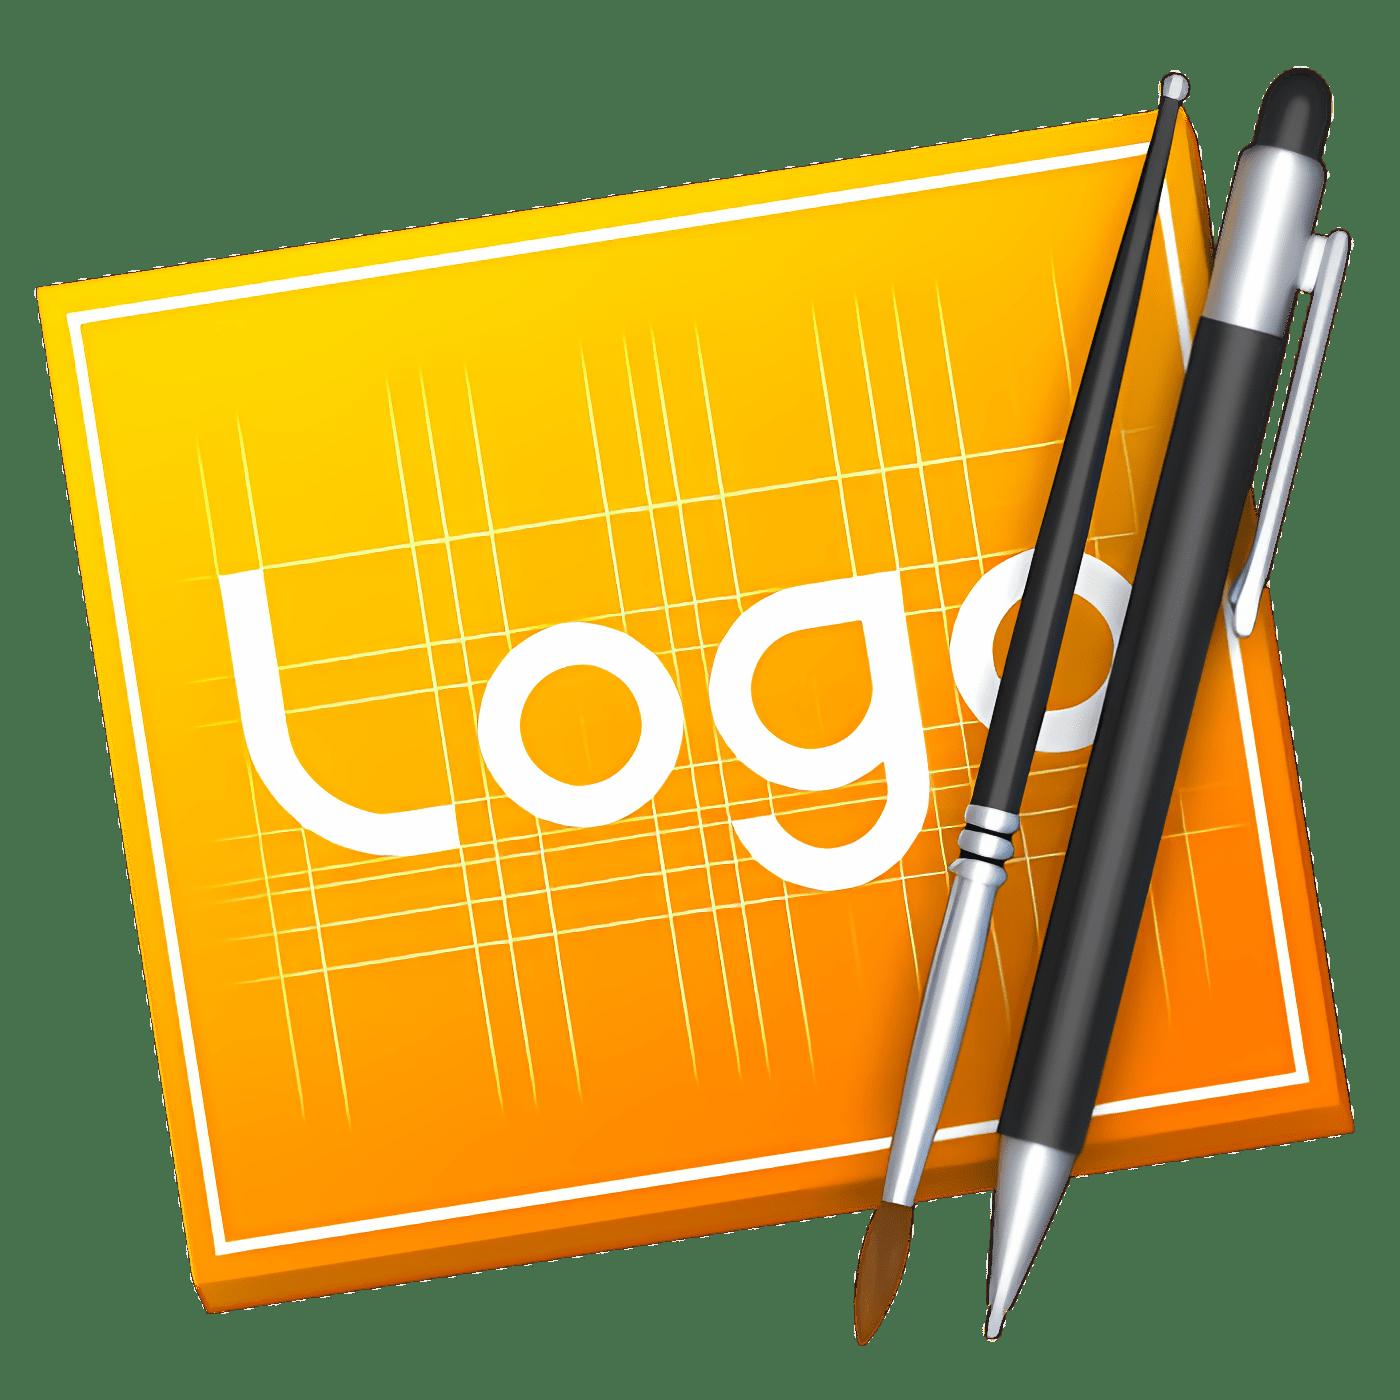 Logoist 2 2.6.1